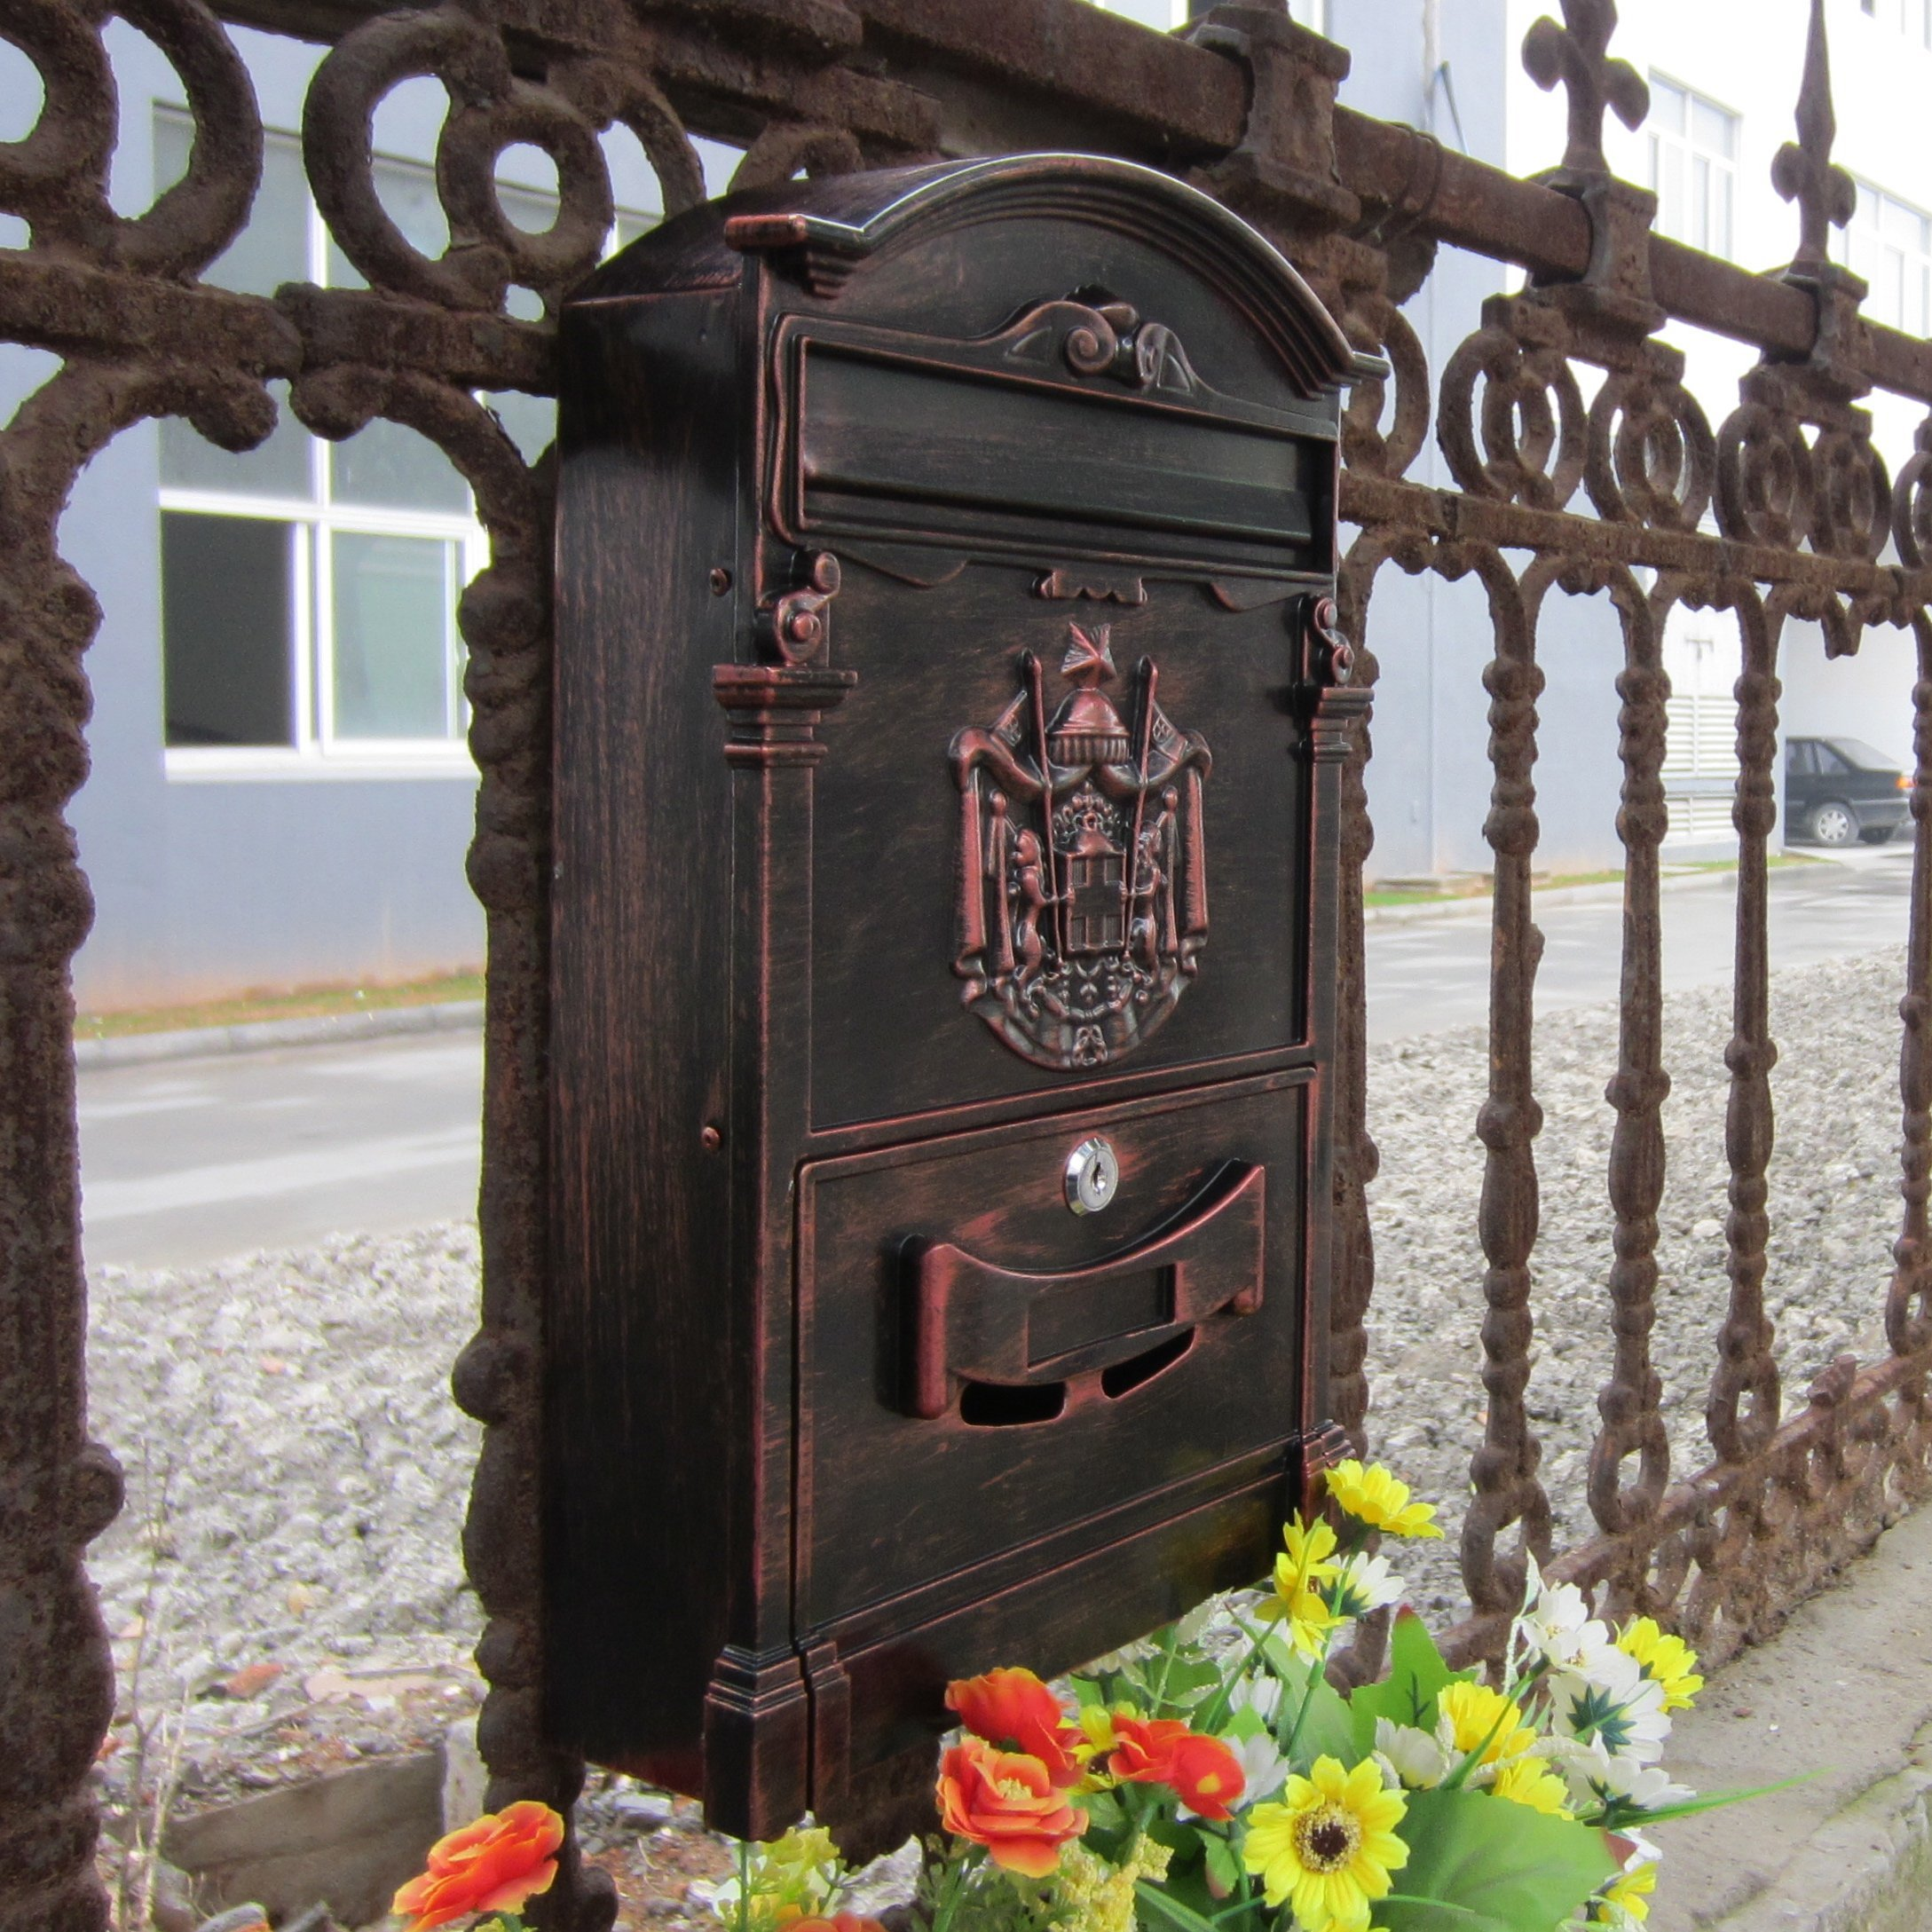 Traditional Aristocratic, Sun Identity Villa Cast Aluminum Mailboxes 49 Colors Available (01 Red Antique Bronze)